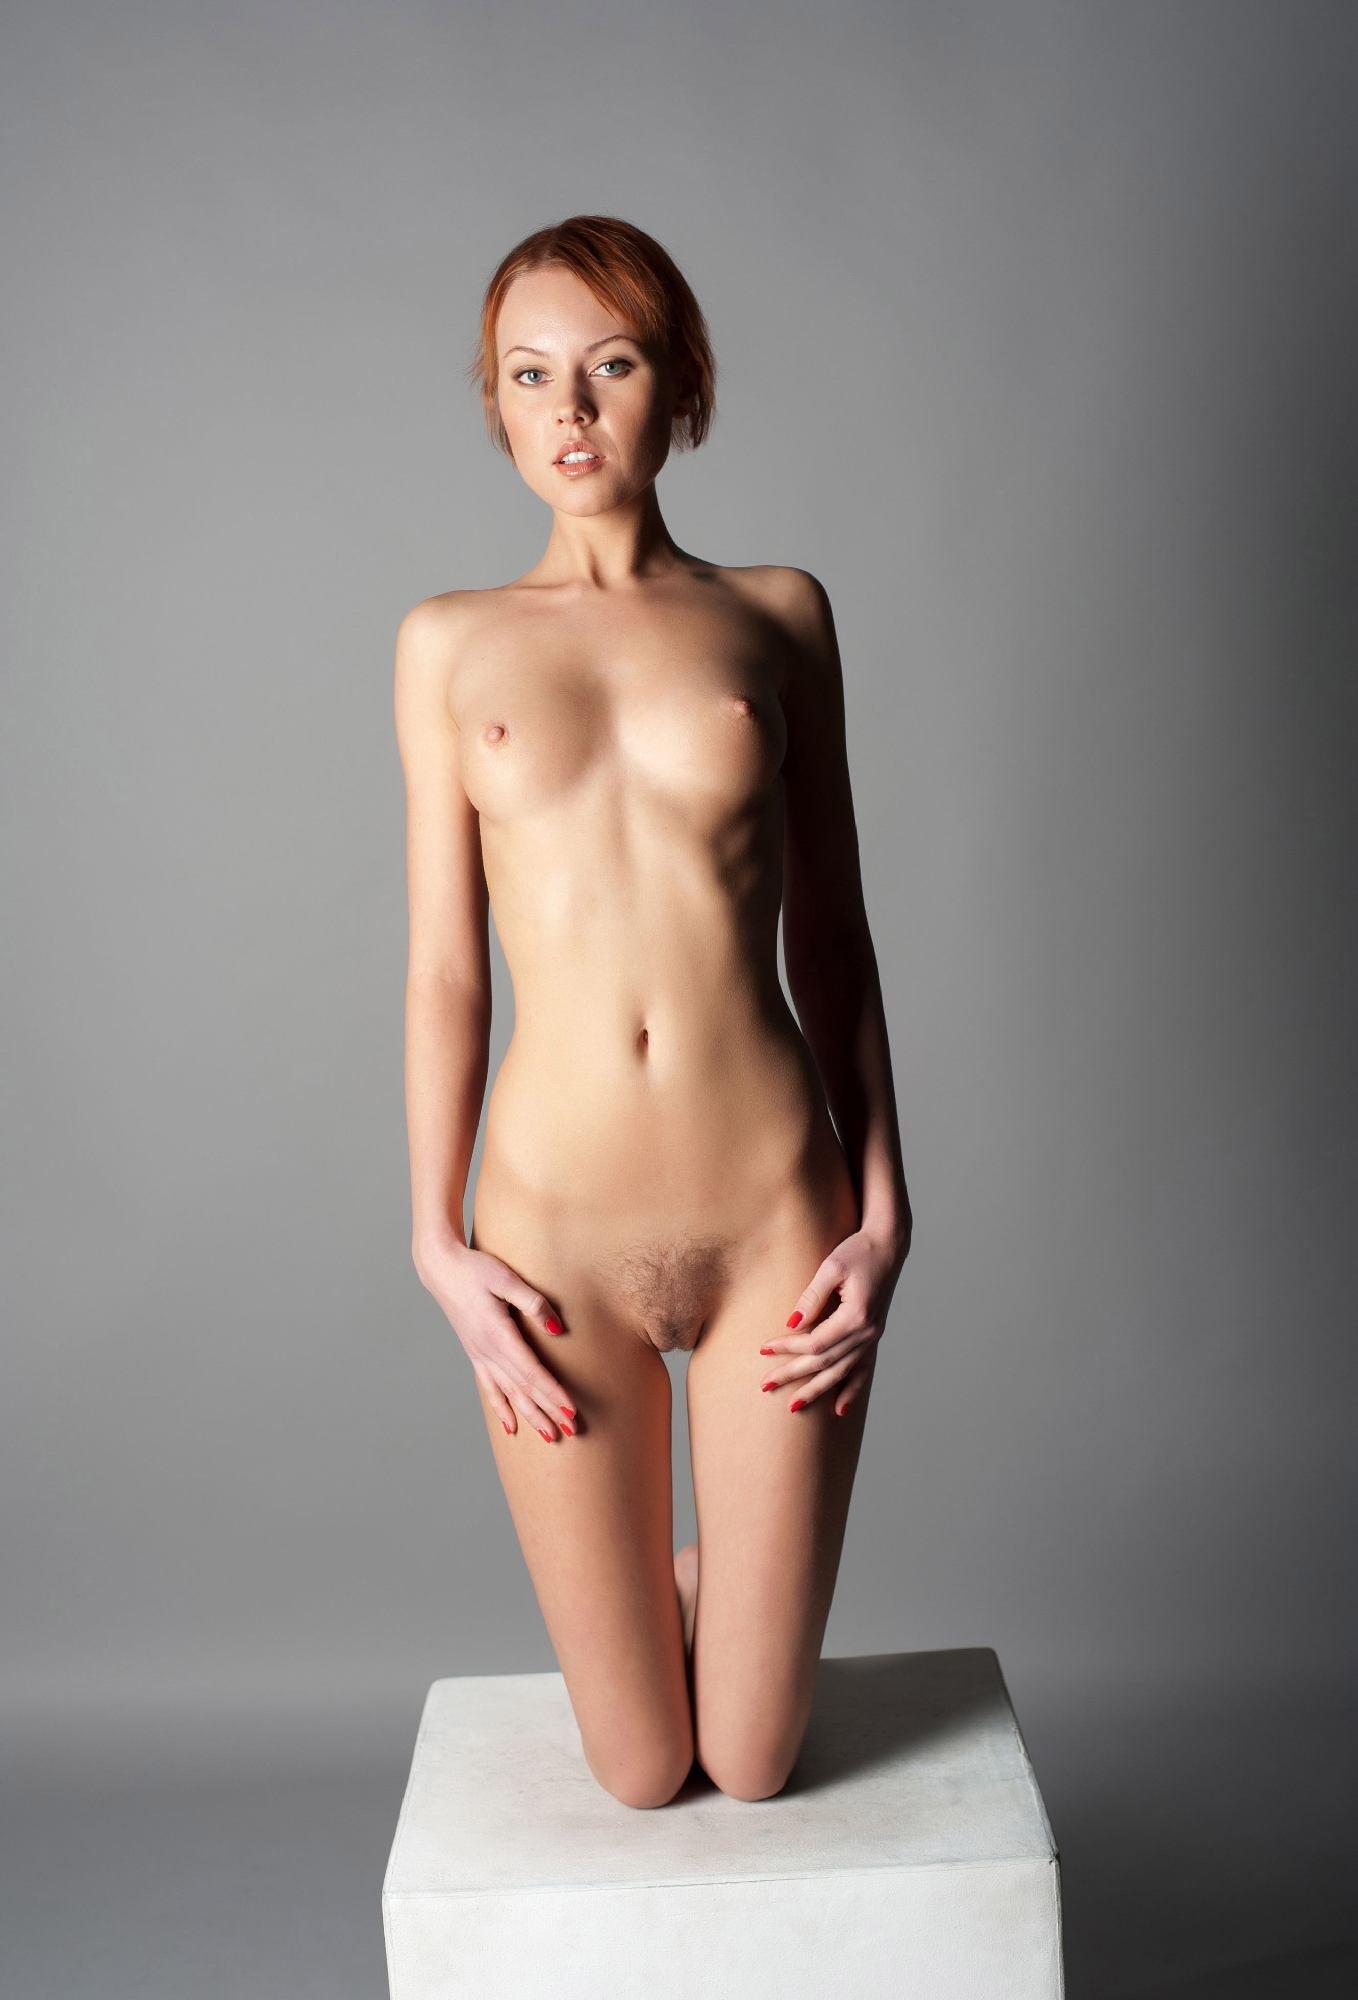 ochen-hudenkie-devushki-erotika